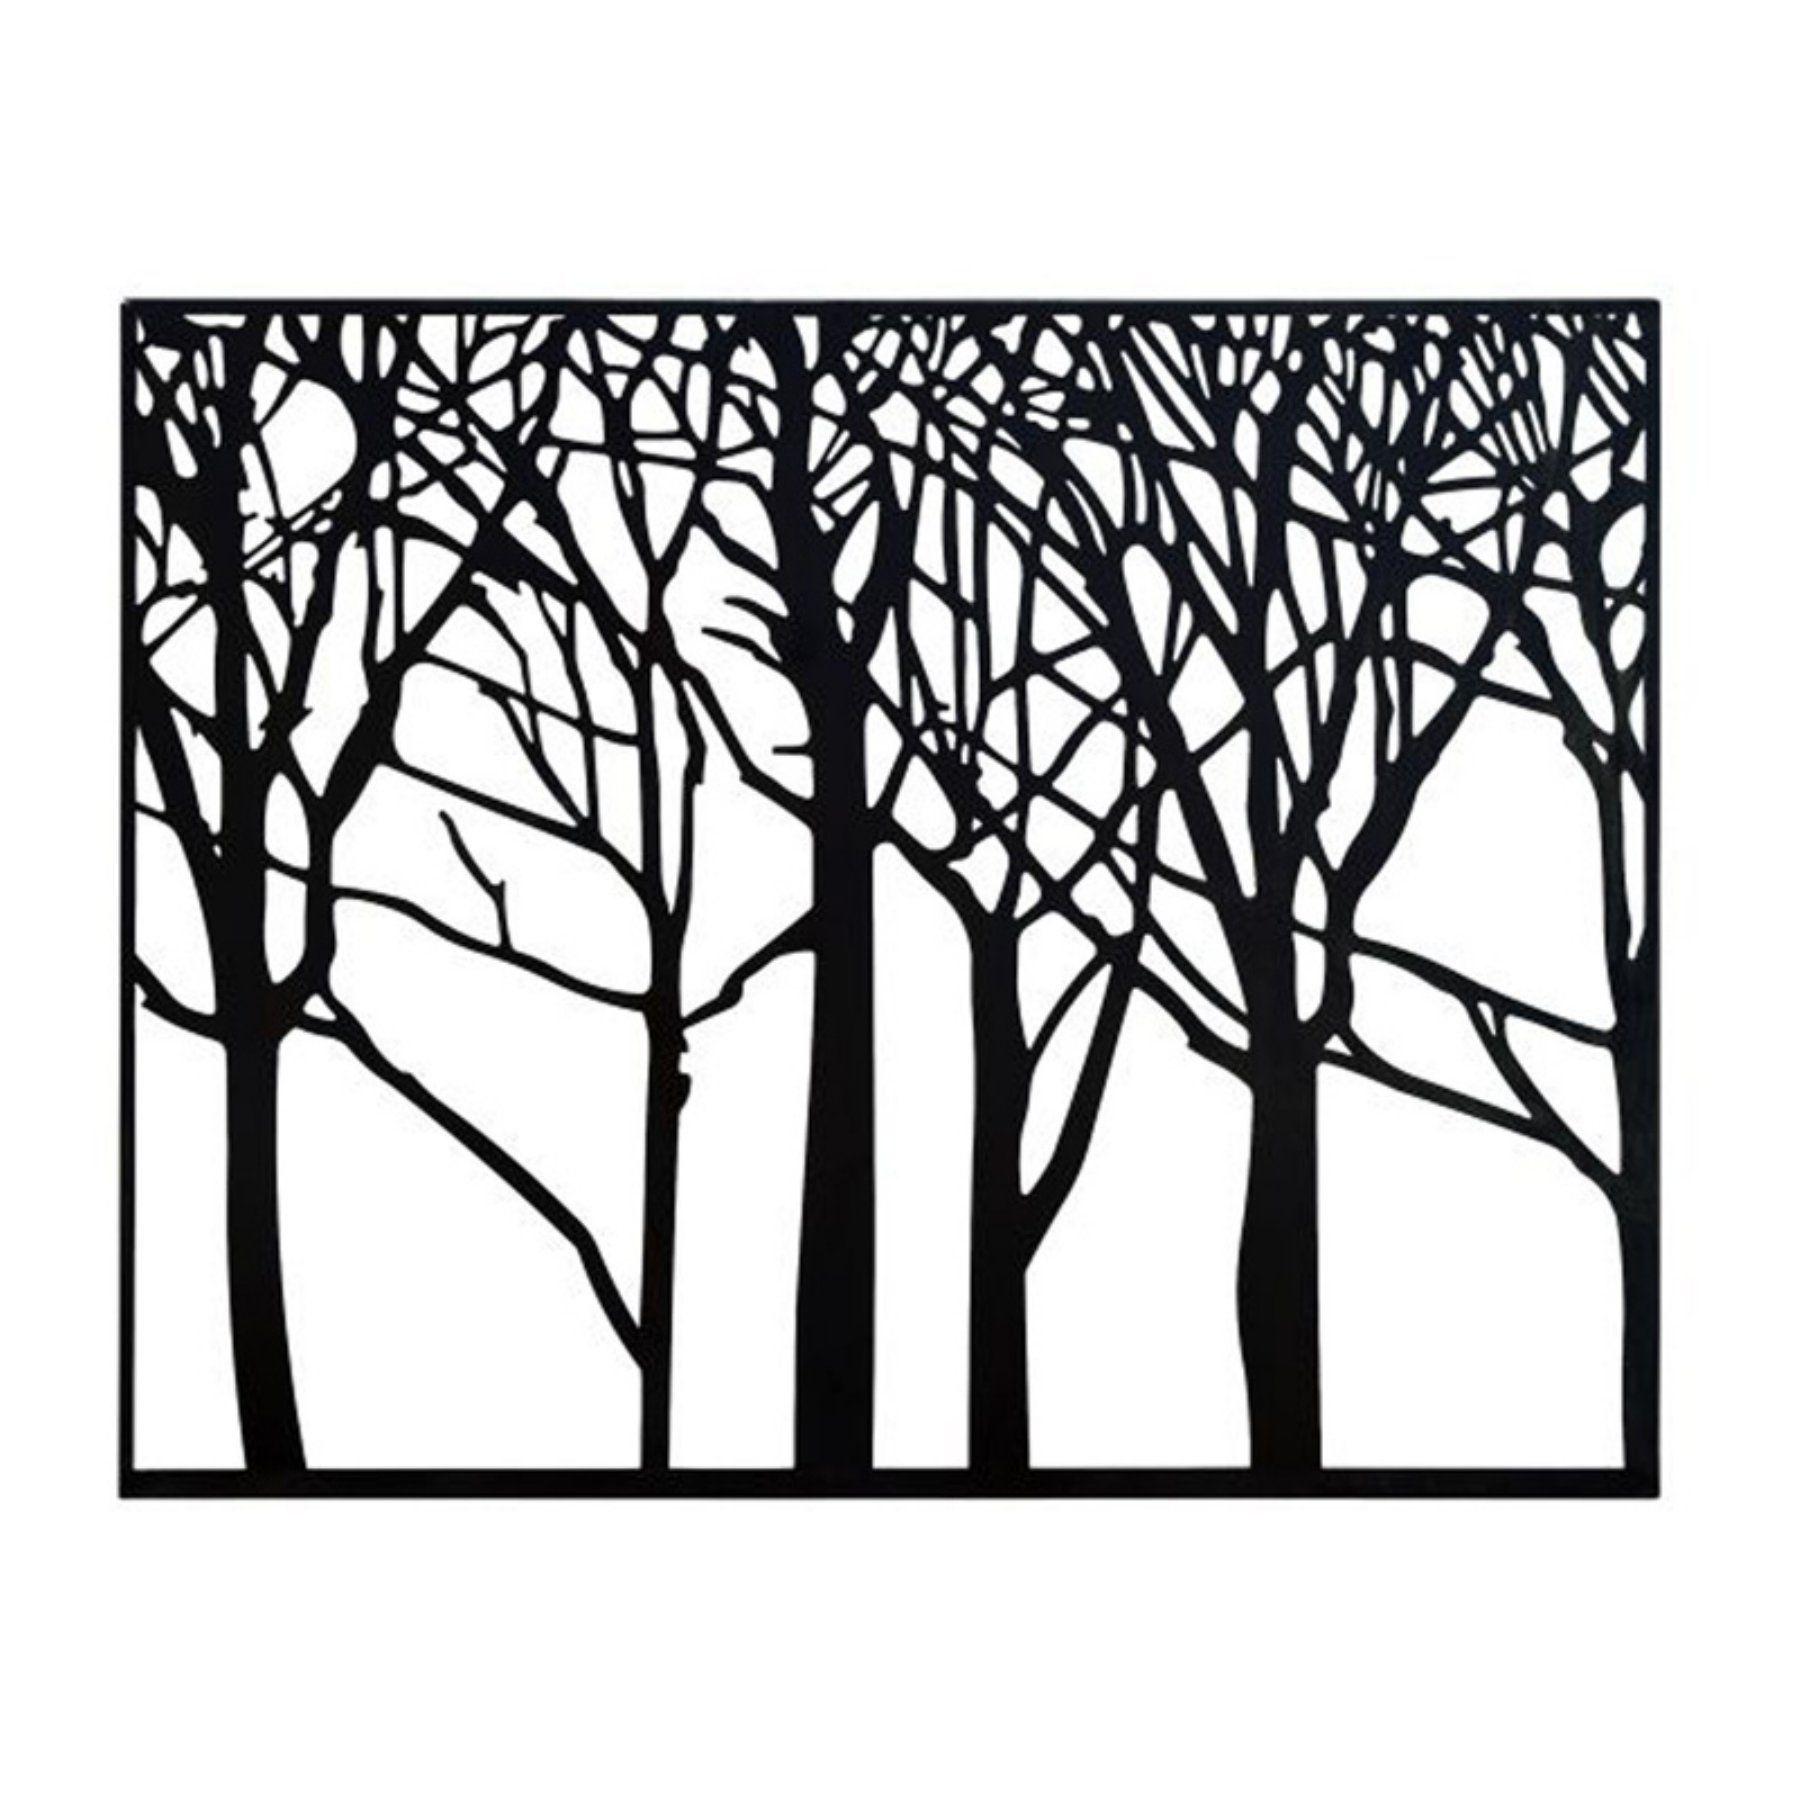 Decmode framed black metal tree silhouette wall art w x h in